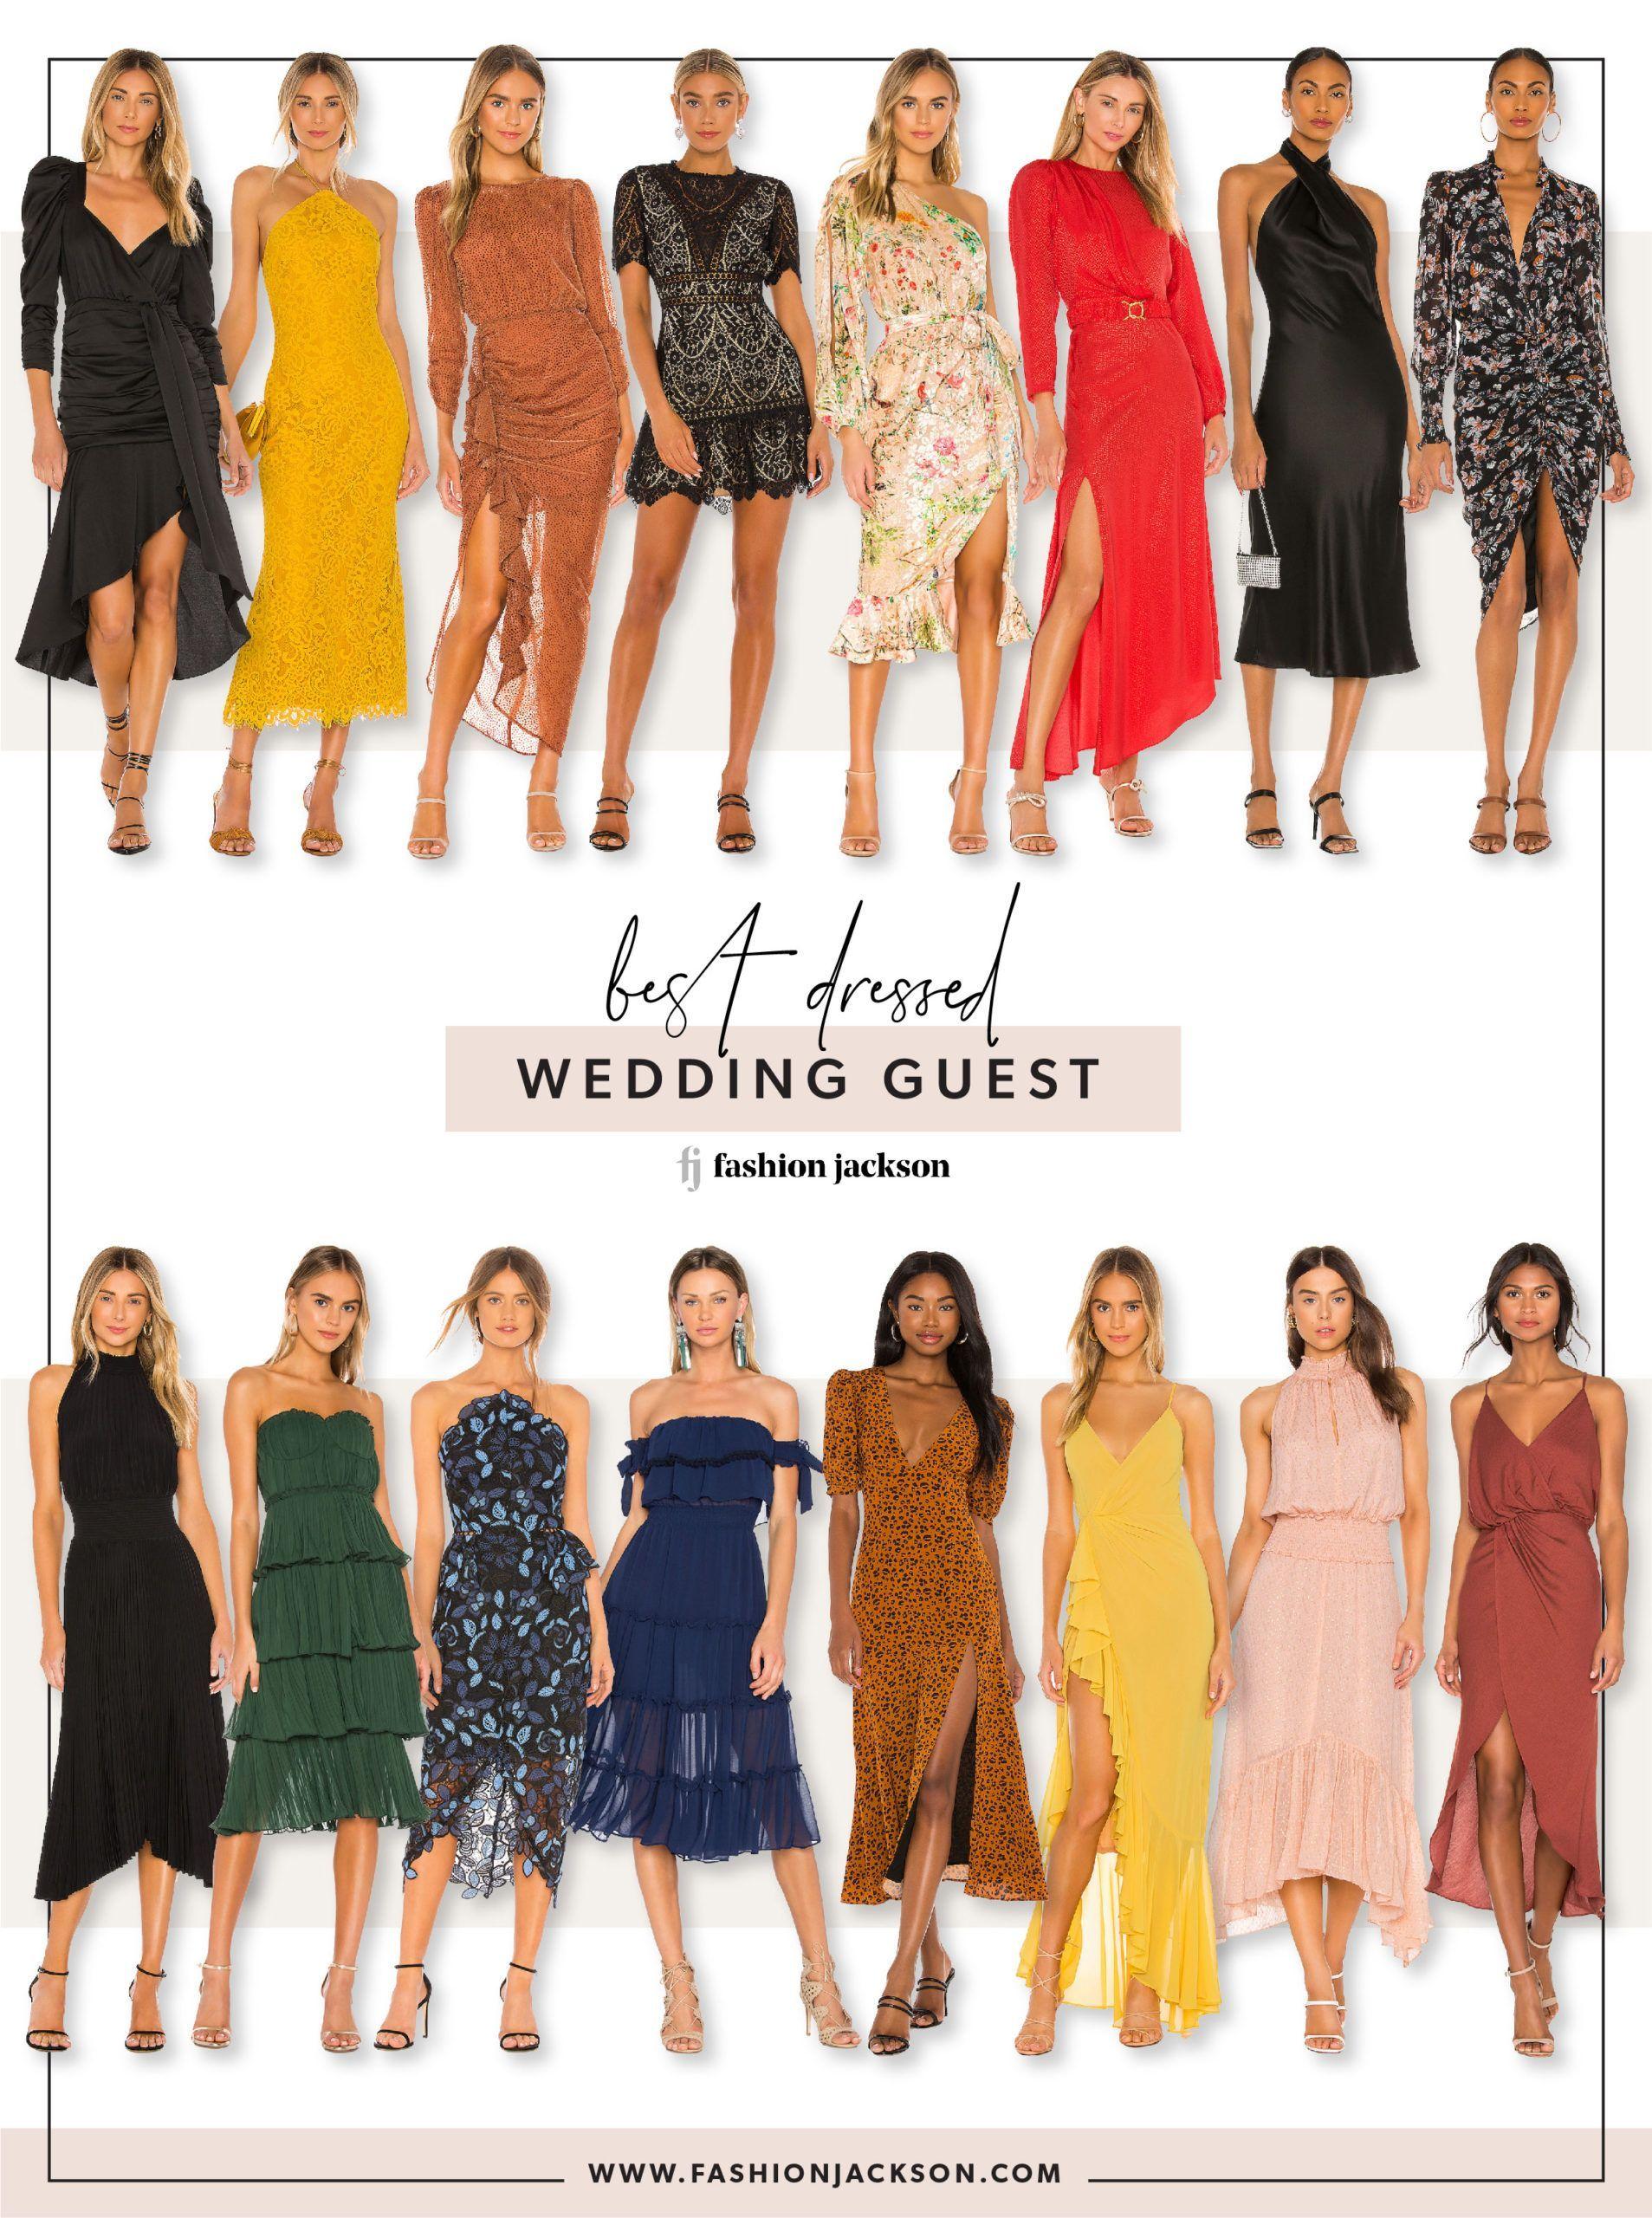 Fall Wedding Guest Dresses Fashion Jackson In 2020 Fall Wedding Guest Dress Wedding Guest Dress Fall Wedding Guest [ 2560 x 1907 Pixel ]